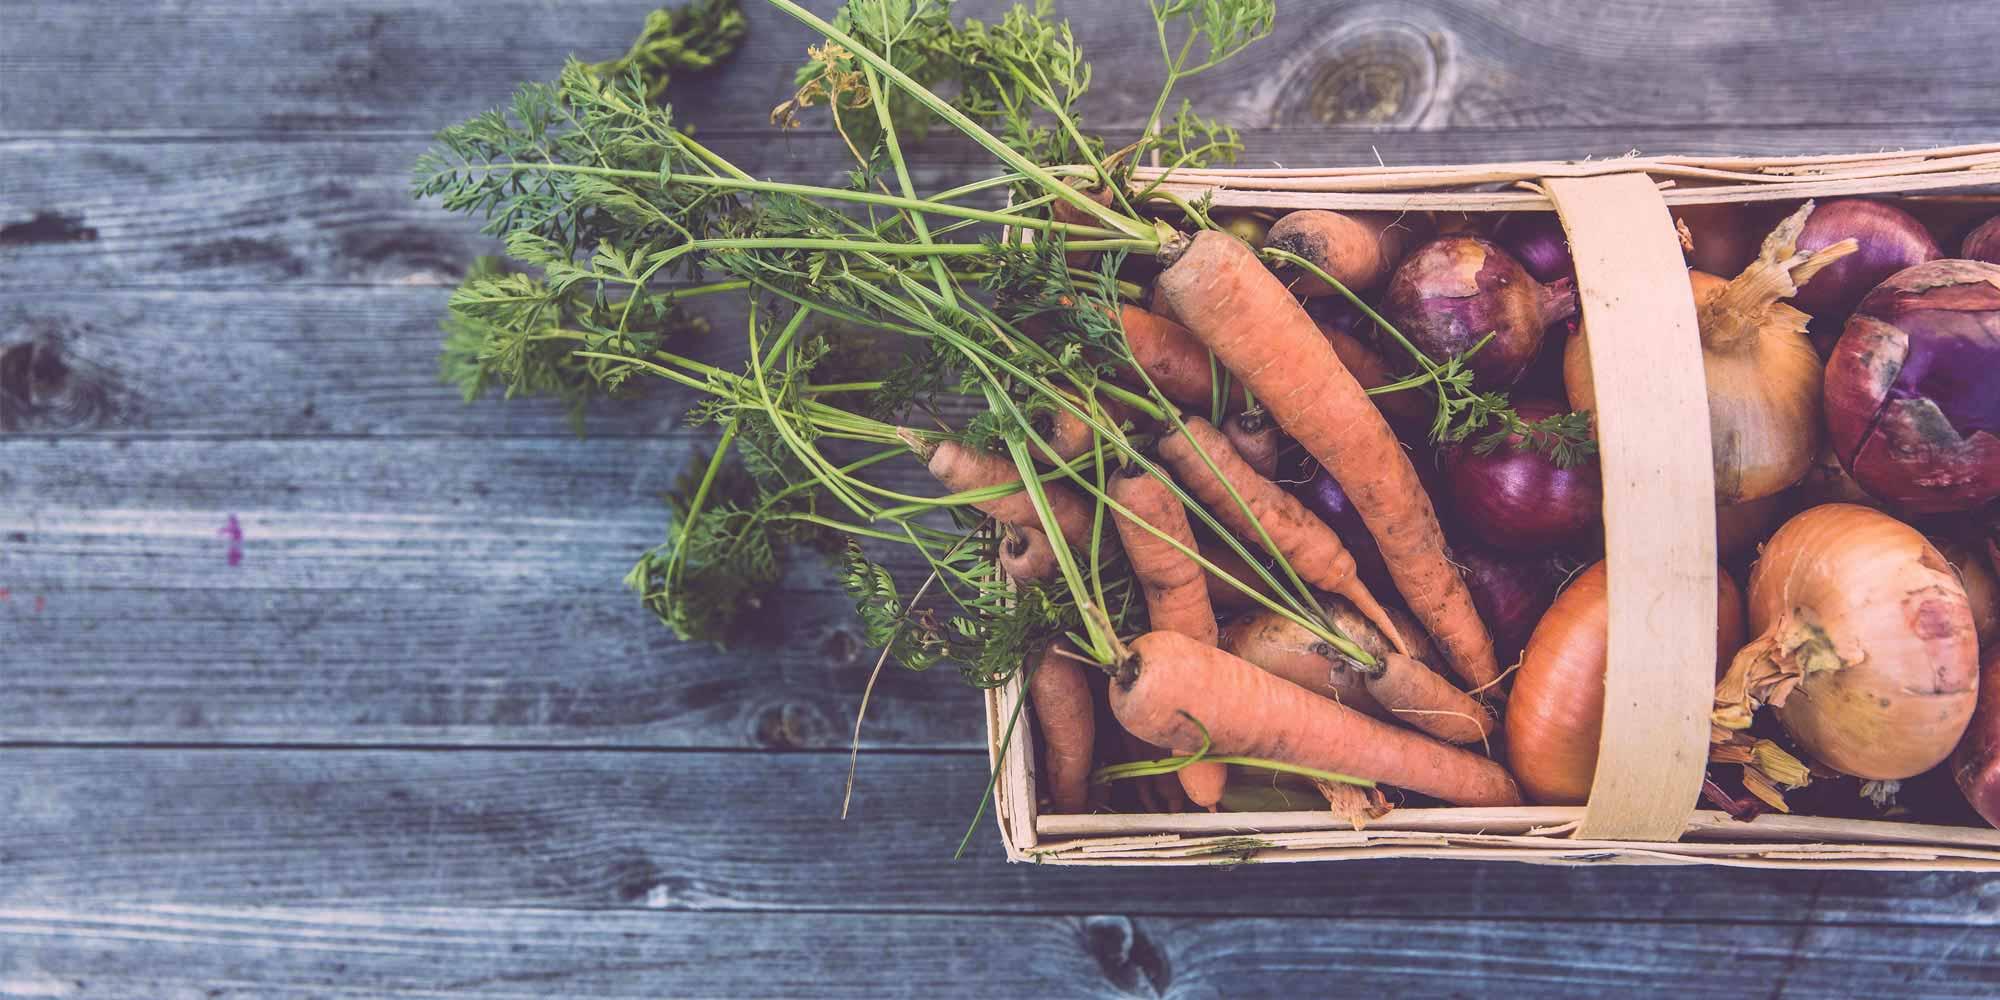 , L'ECORISTORAZIONE: IL VERDE IN CUCINA, Foodiestrip.blog